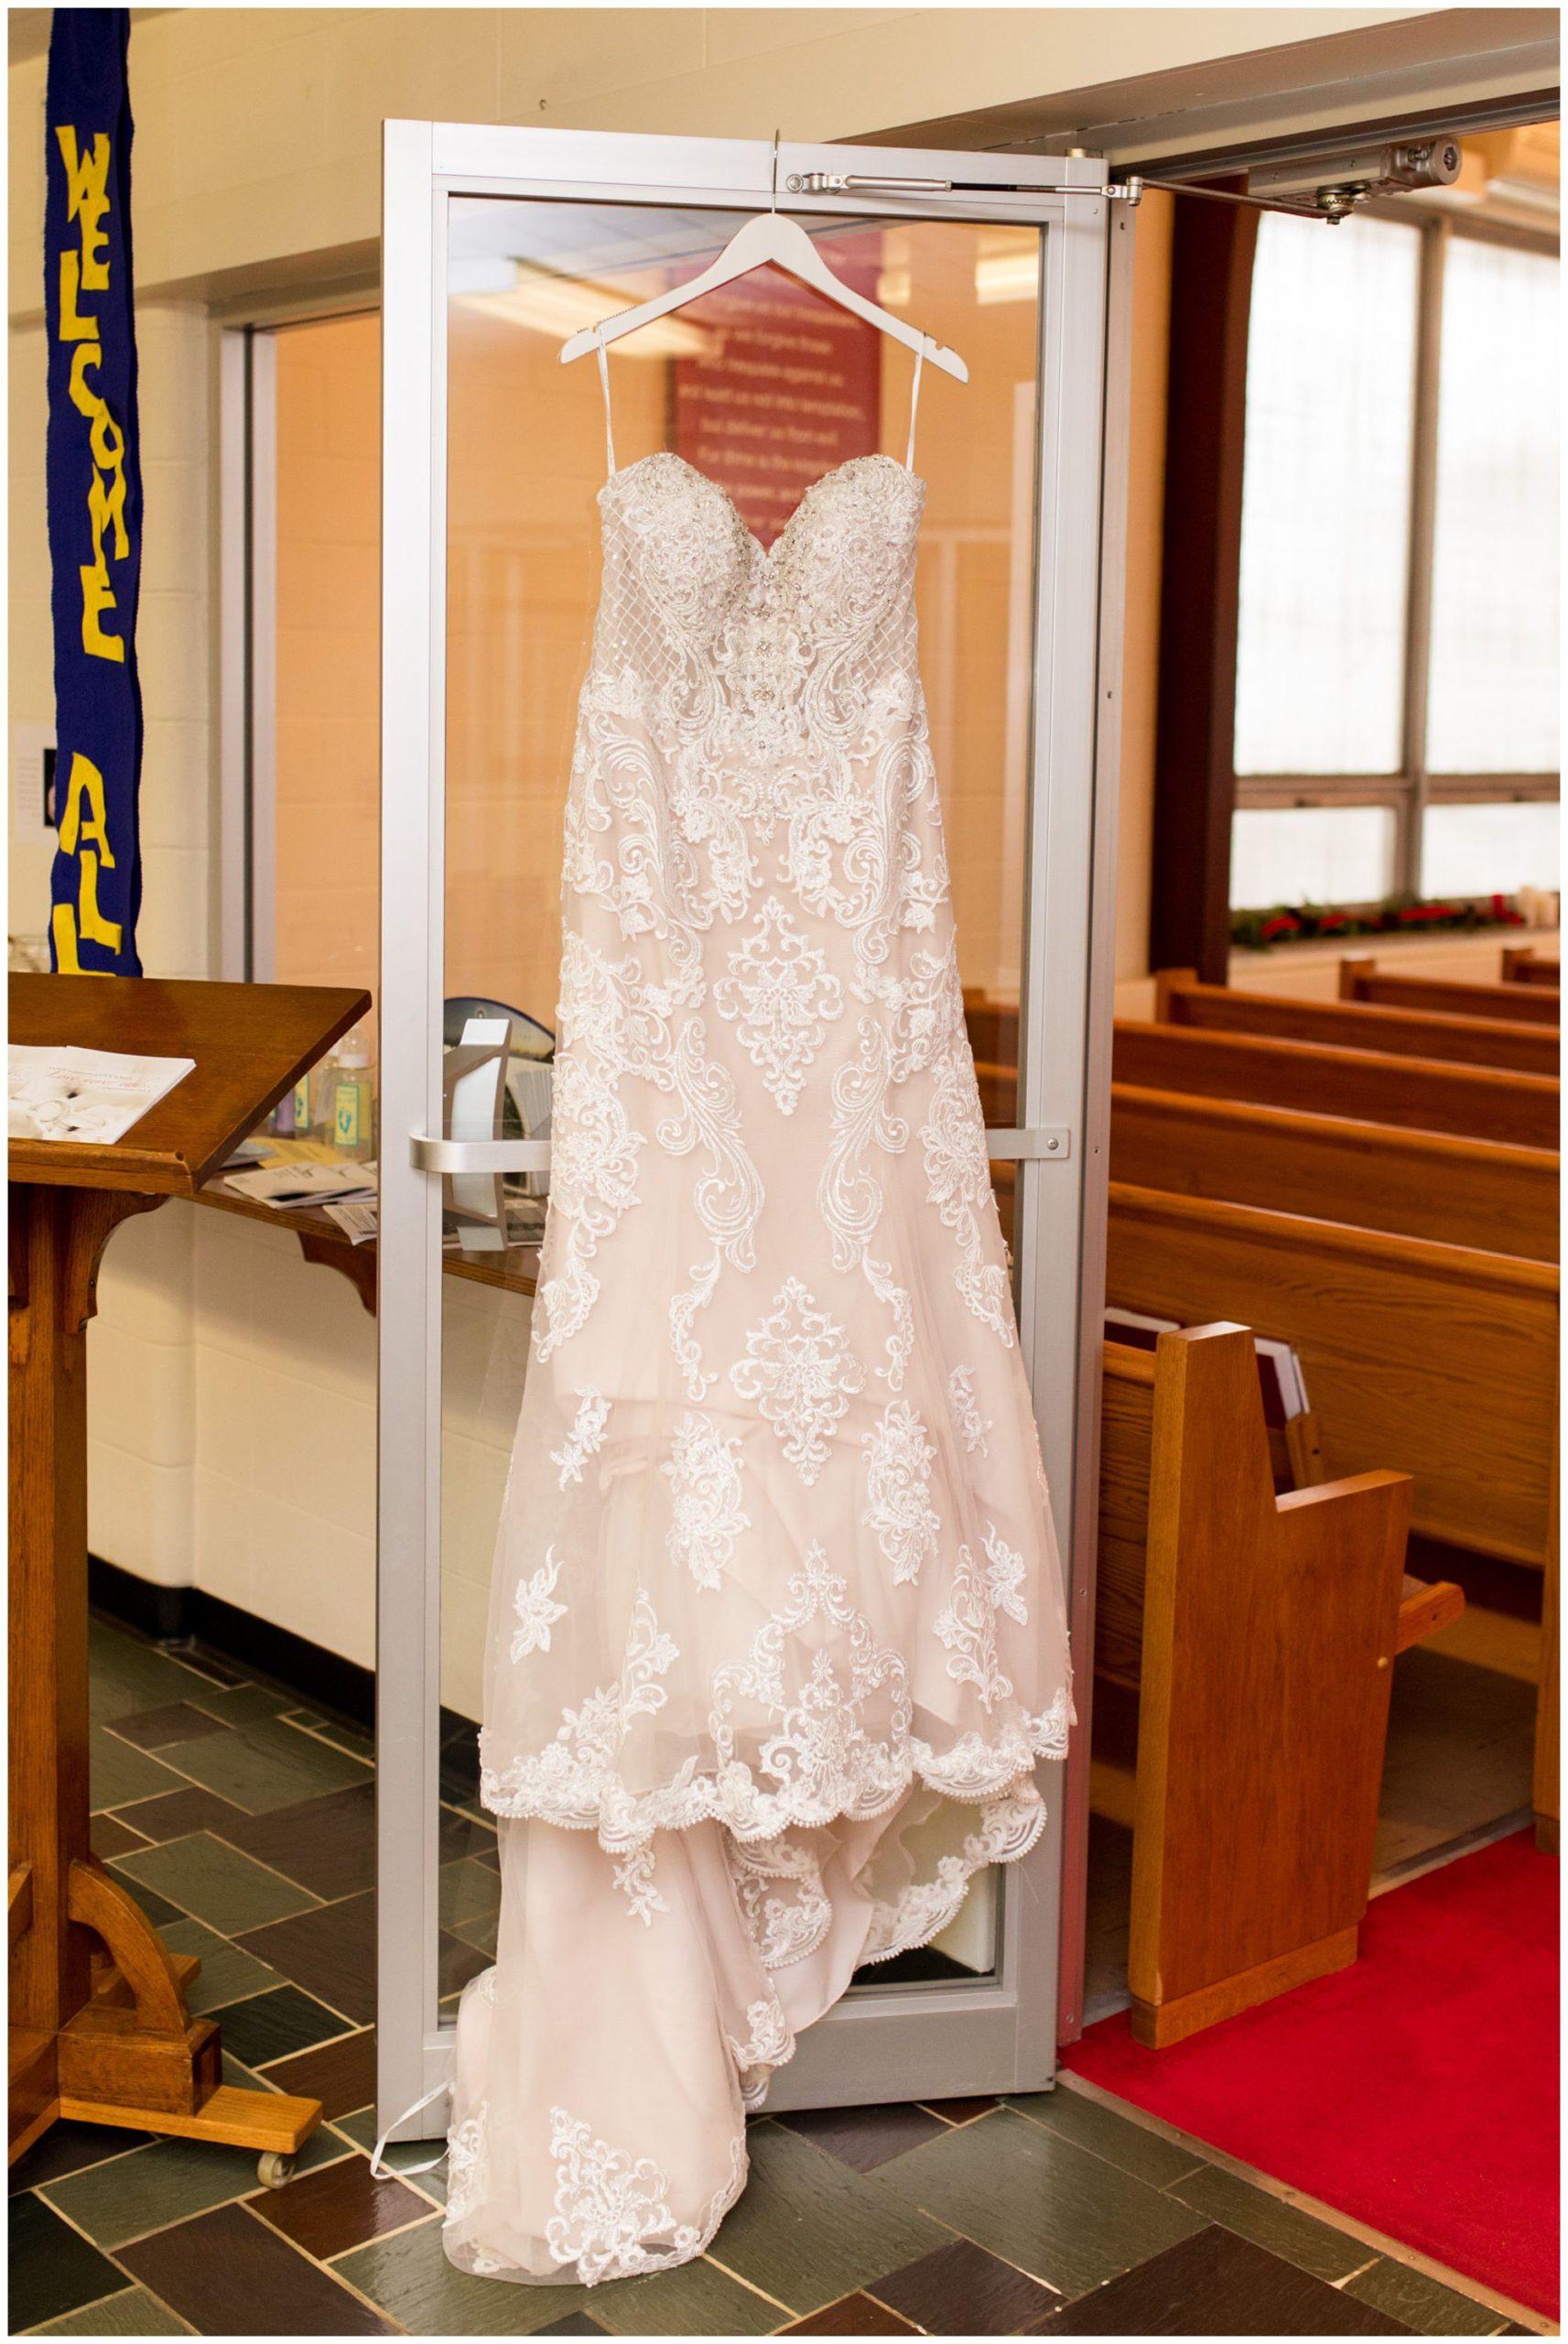 bride's dress in Zion Lutheran Church in Portland Indiana